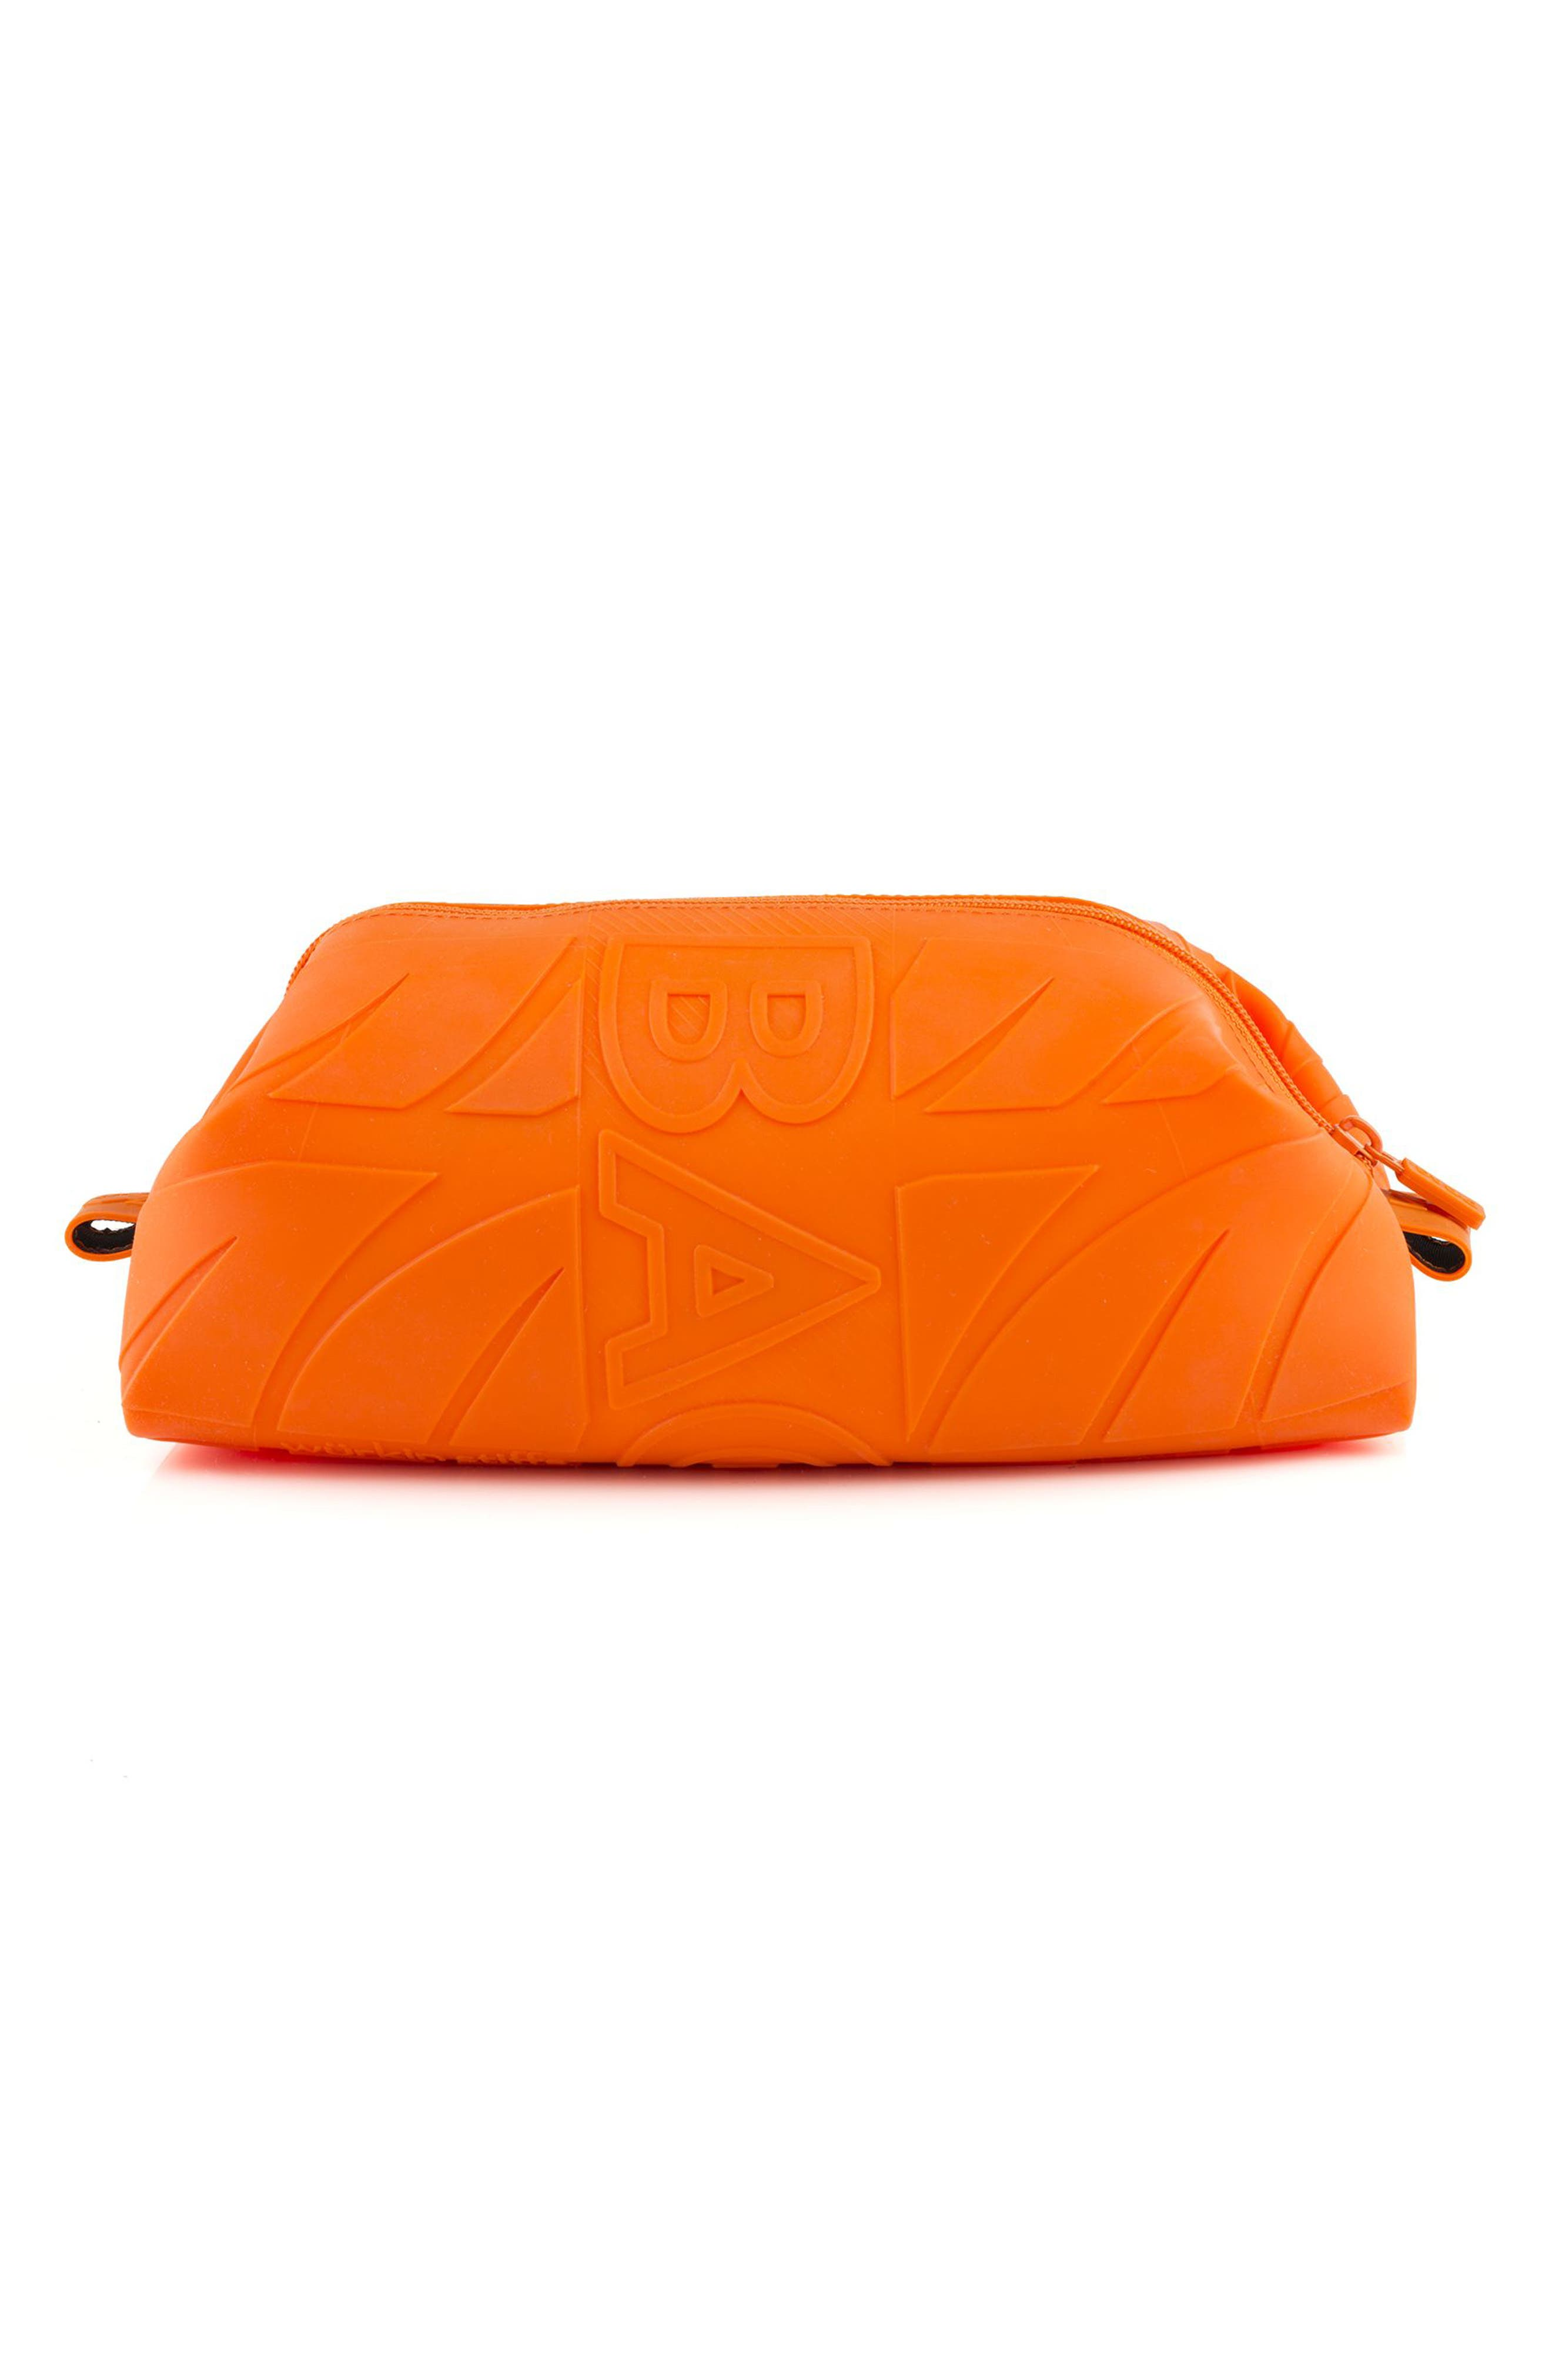 Silicone Travel Kit,                             Main thumbnail 1, color,                             Orange